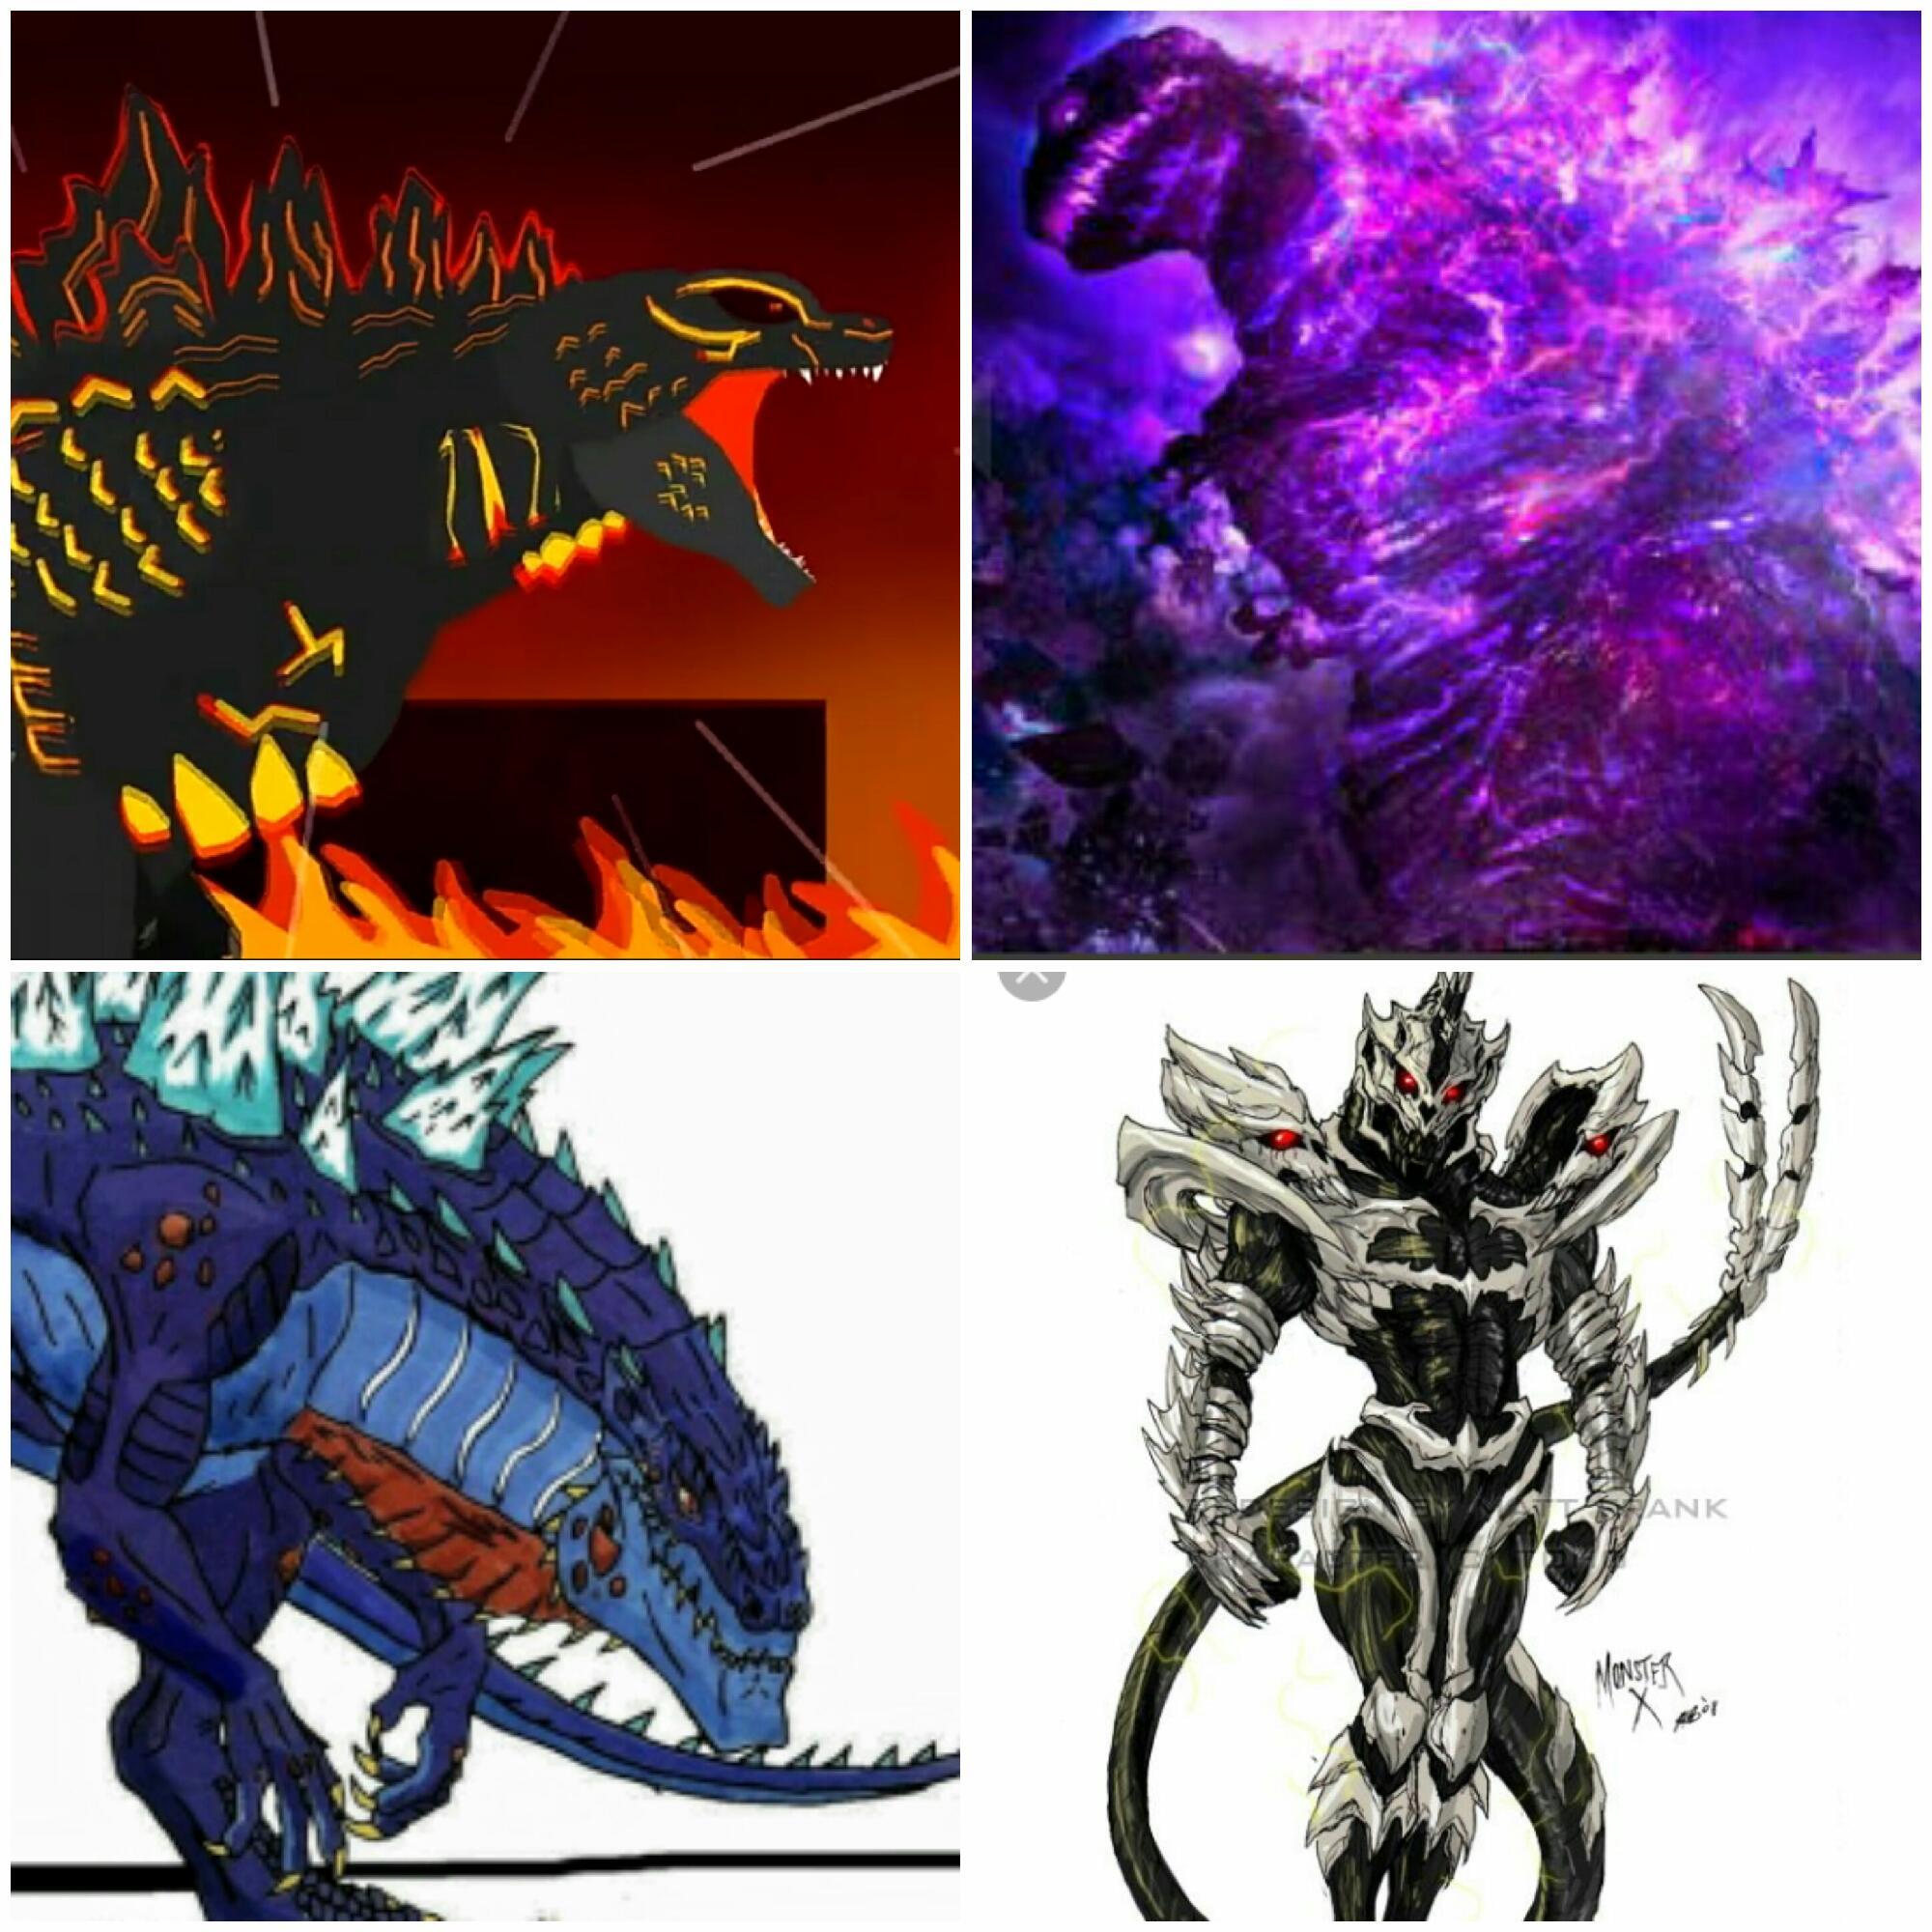 fire godzilla y zilla vs shin godzilla y monster x